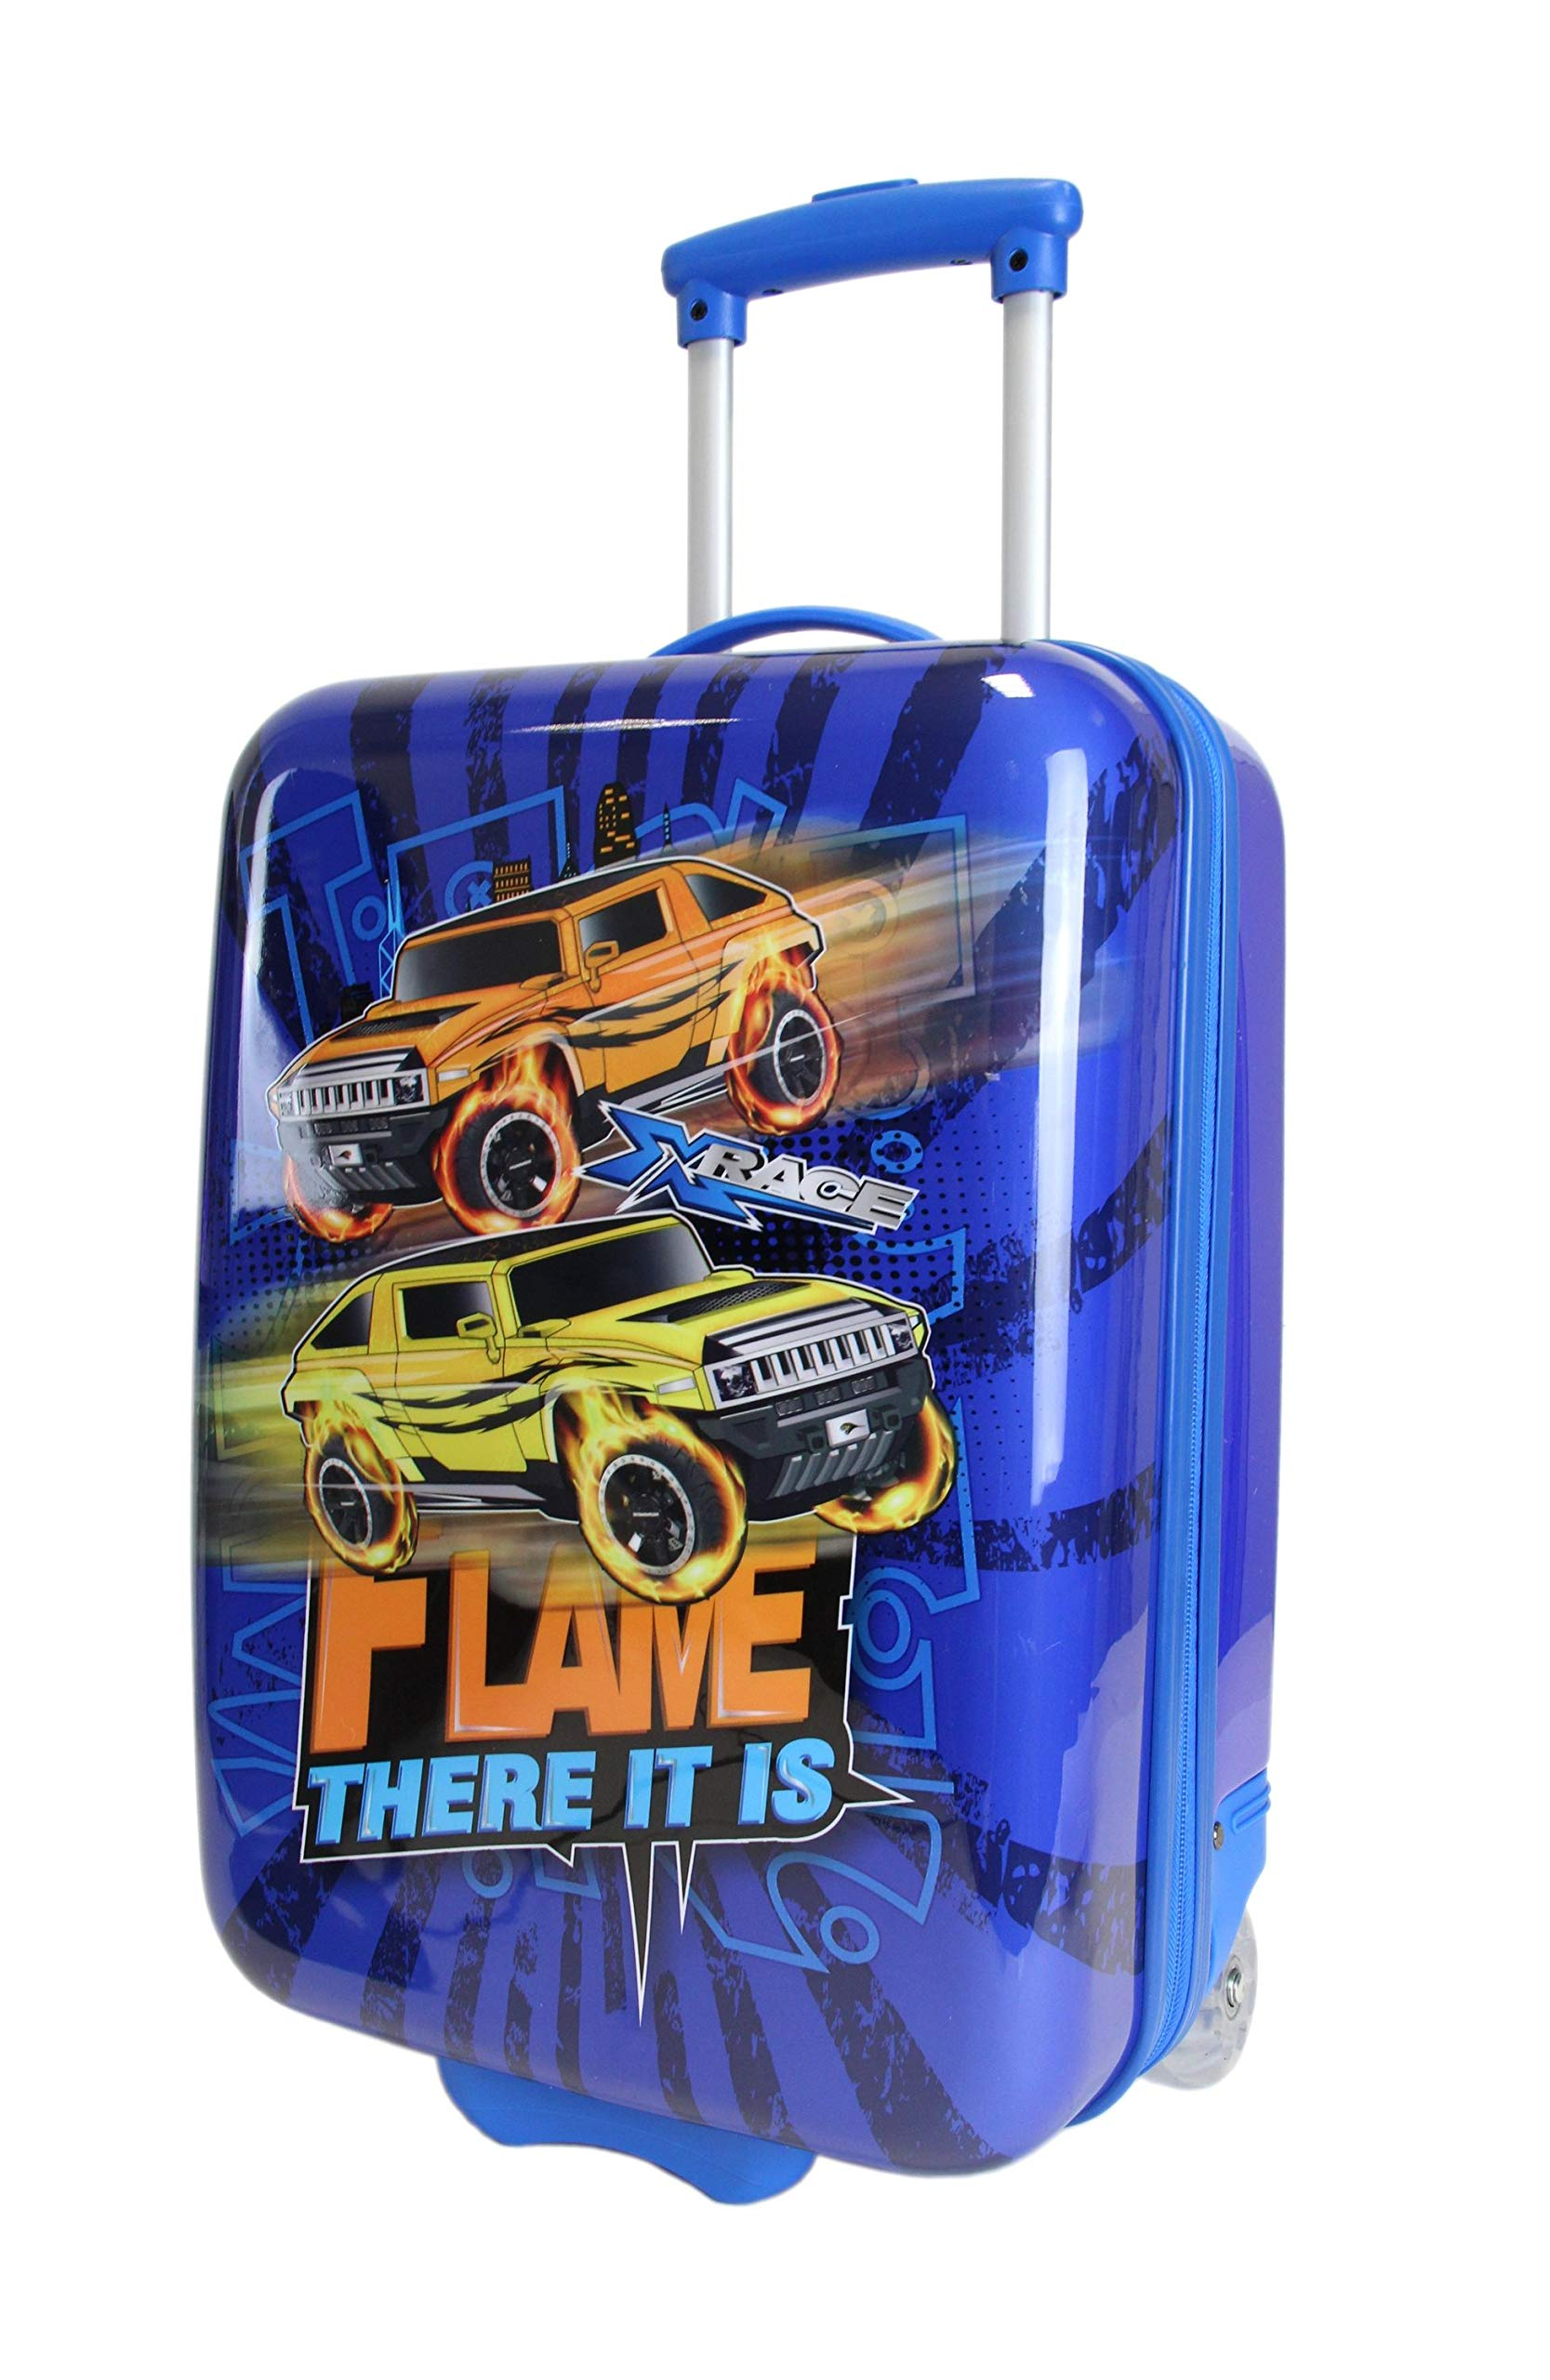 Frentree-Car-Race-Jungen-Kinder-Trolley-Hartschalen-Handgepck-Reisekoffer